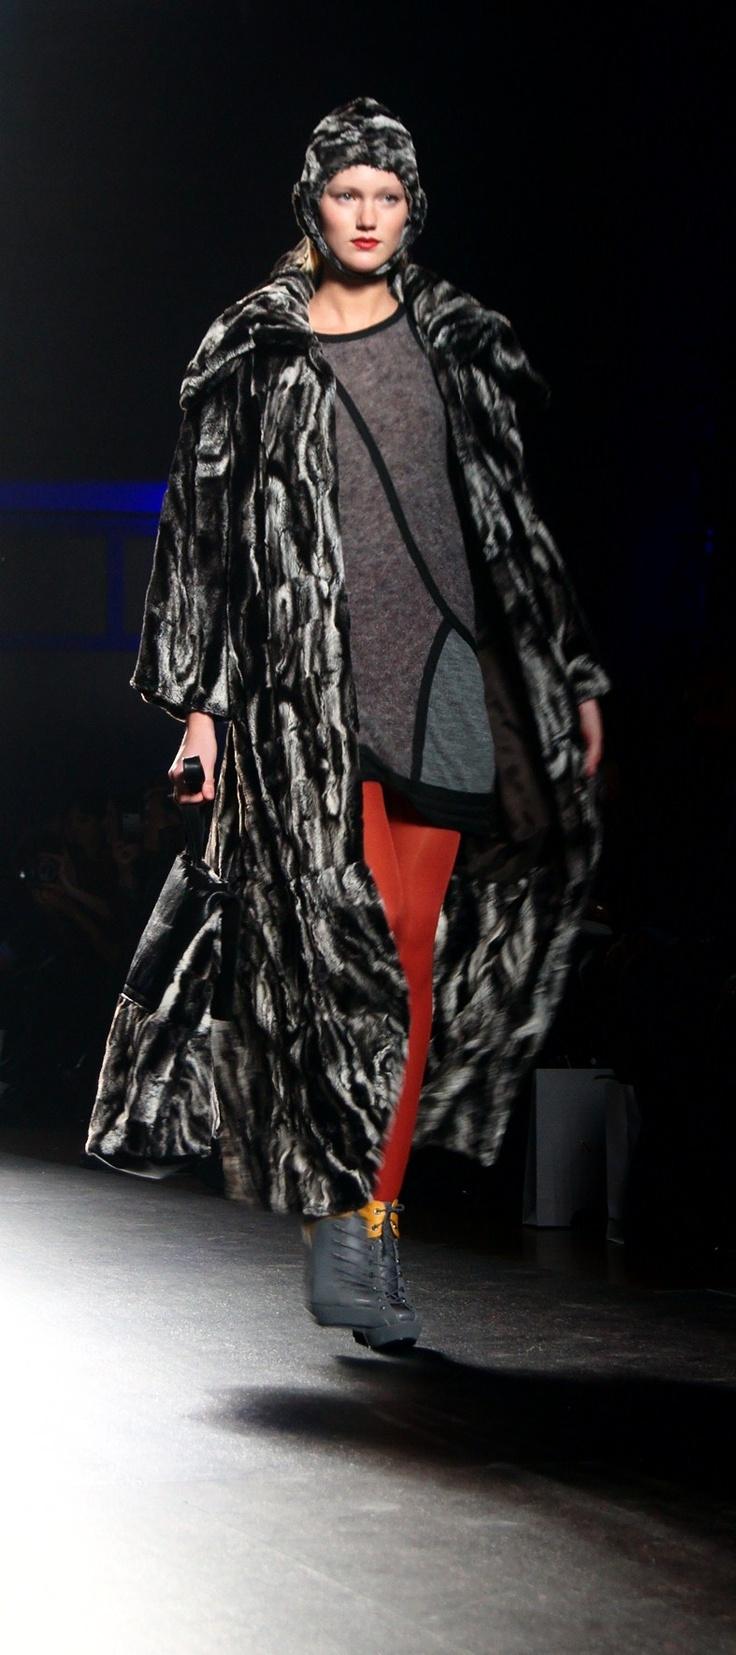 Messcalino en la 080 Fashion Barcelona para el 8º núm de LittleBit Magazine